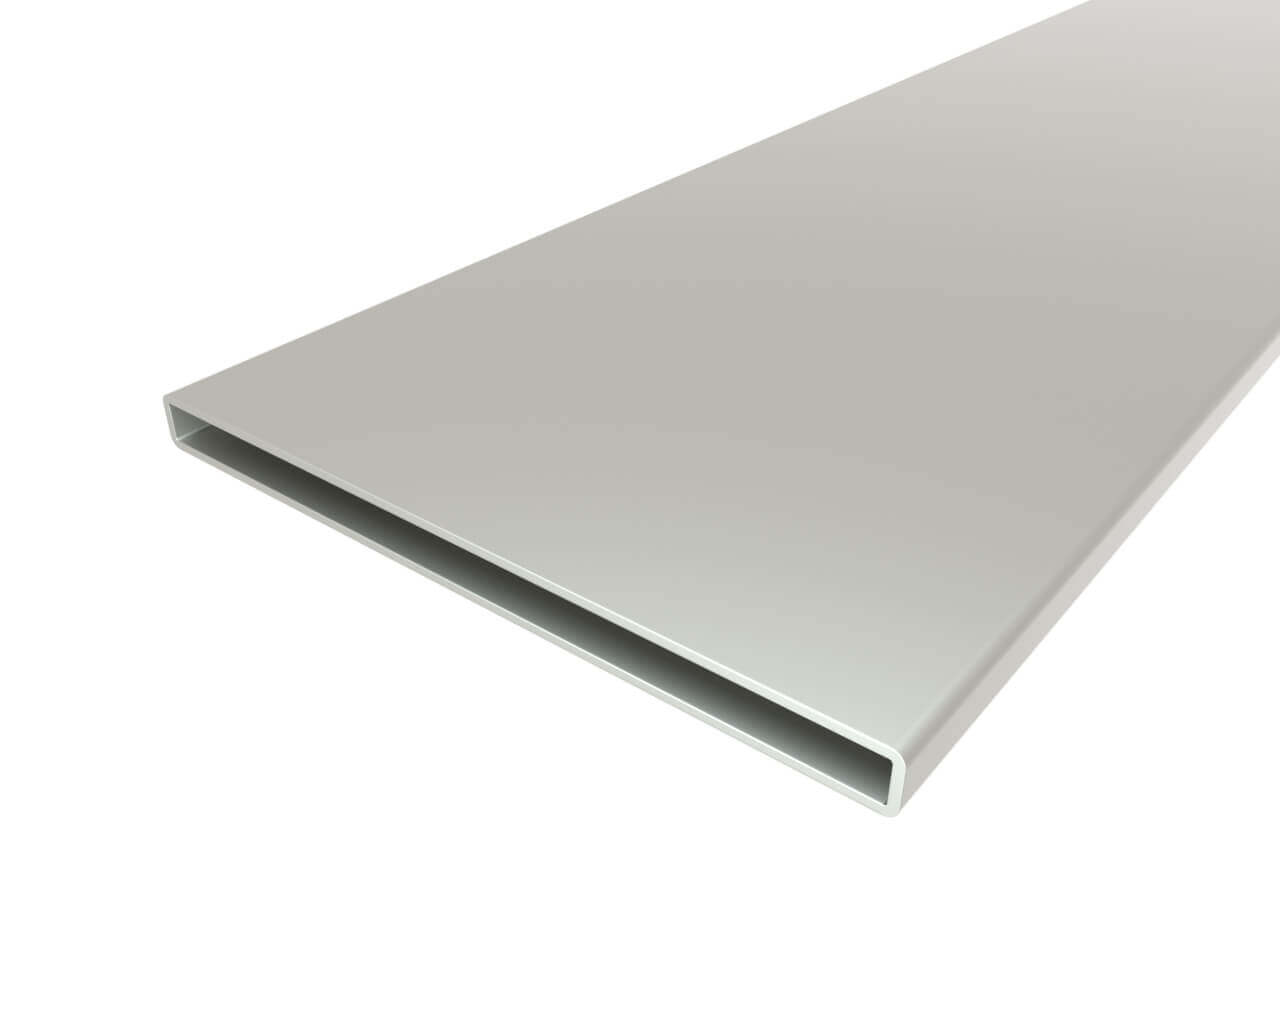 Алюминиевая пластина для ленты LC-AP-01625-2 anod